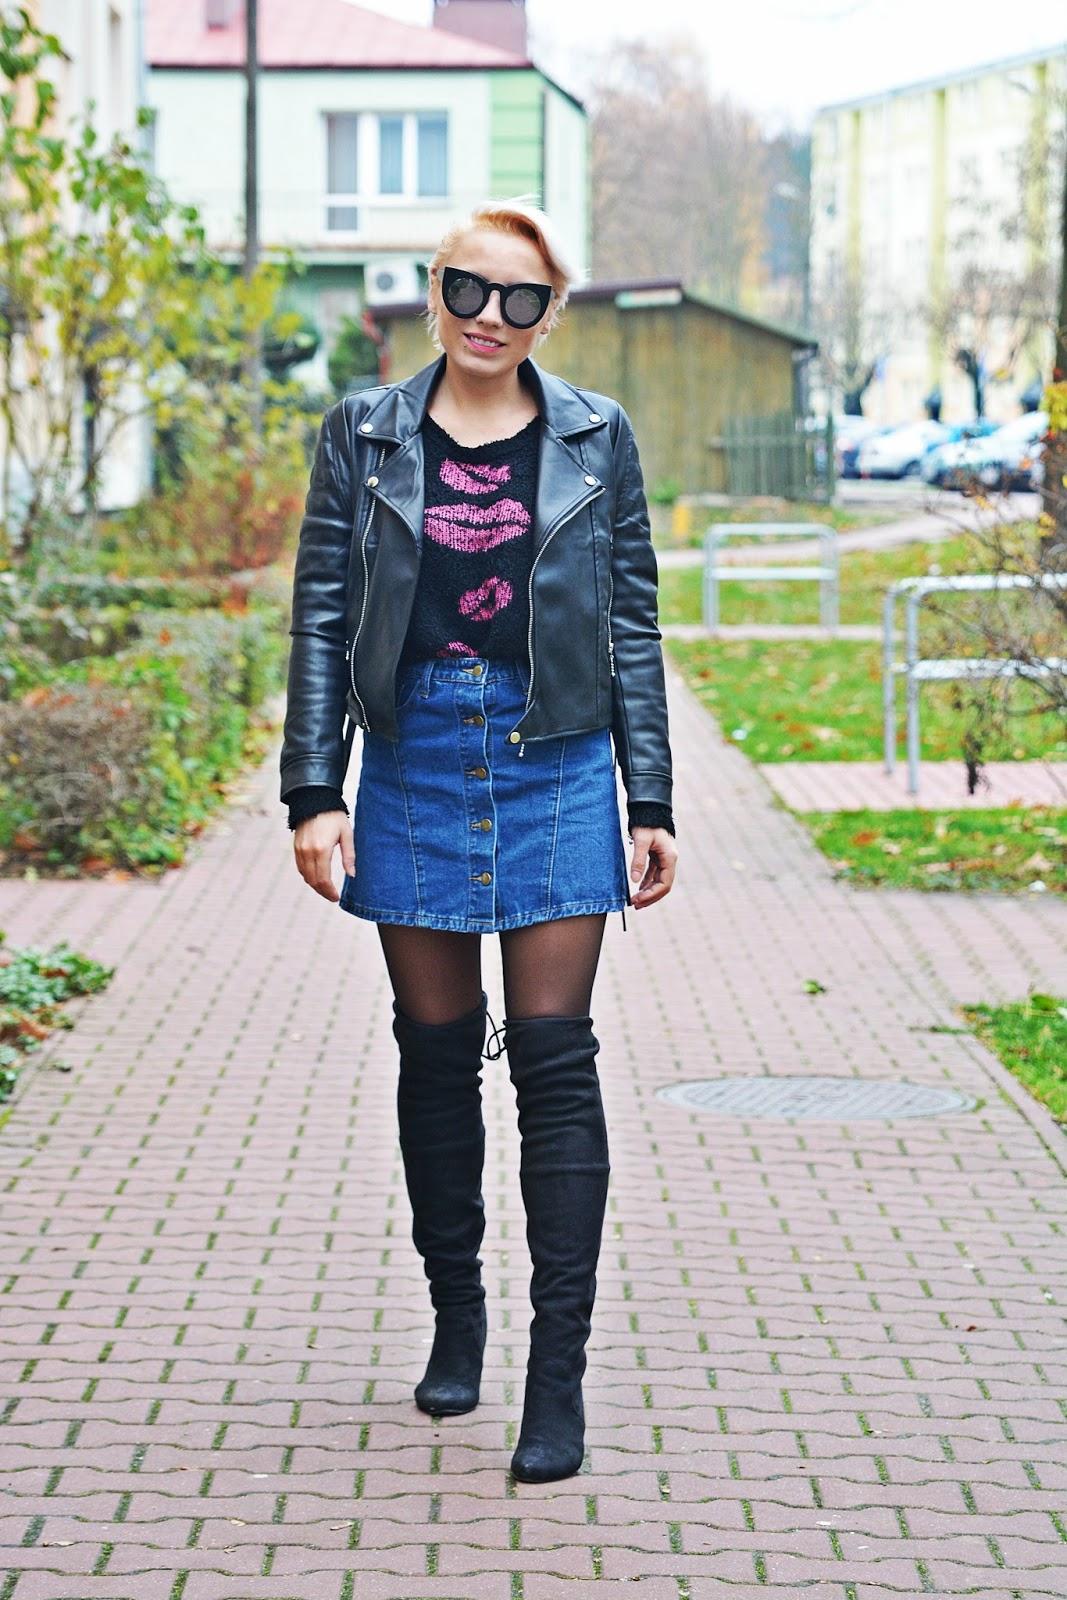 jeansowa_spodnica_skorzana_ramoneska_buty_za_kolano_karyn1